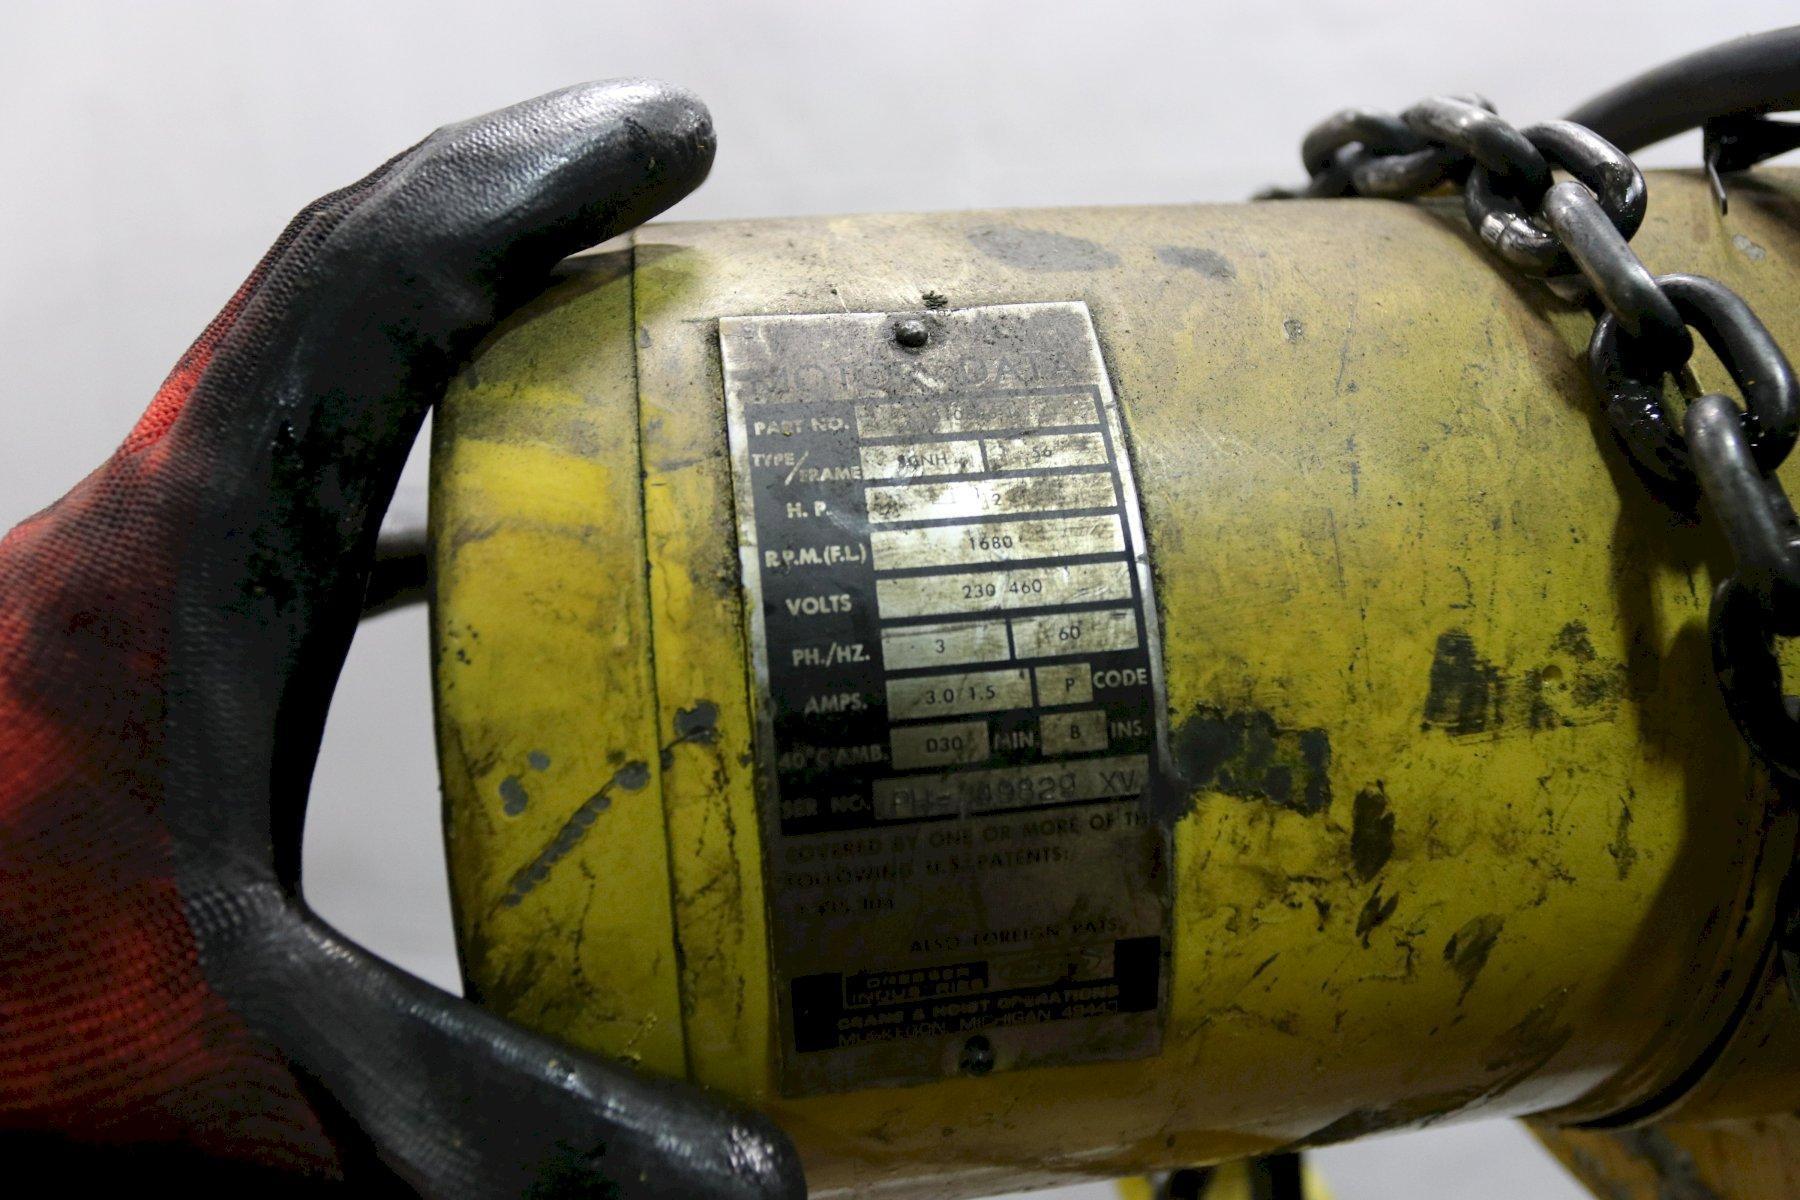 1/4 TON BUDGIT ELECTRIC POWERED CHAIN HOIST: STOCK #12001